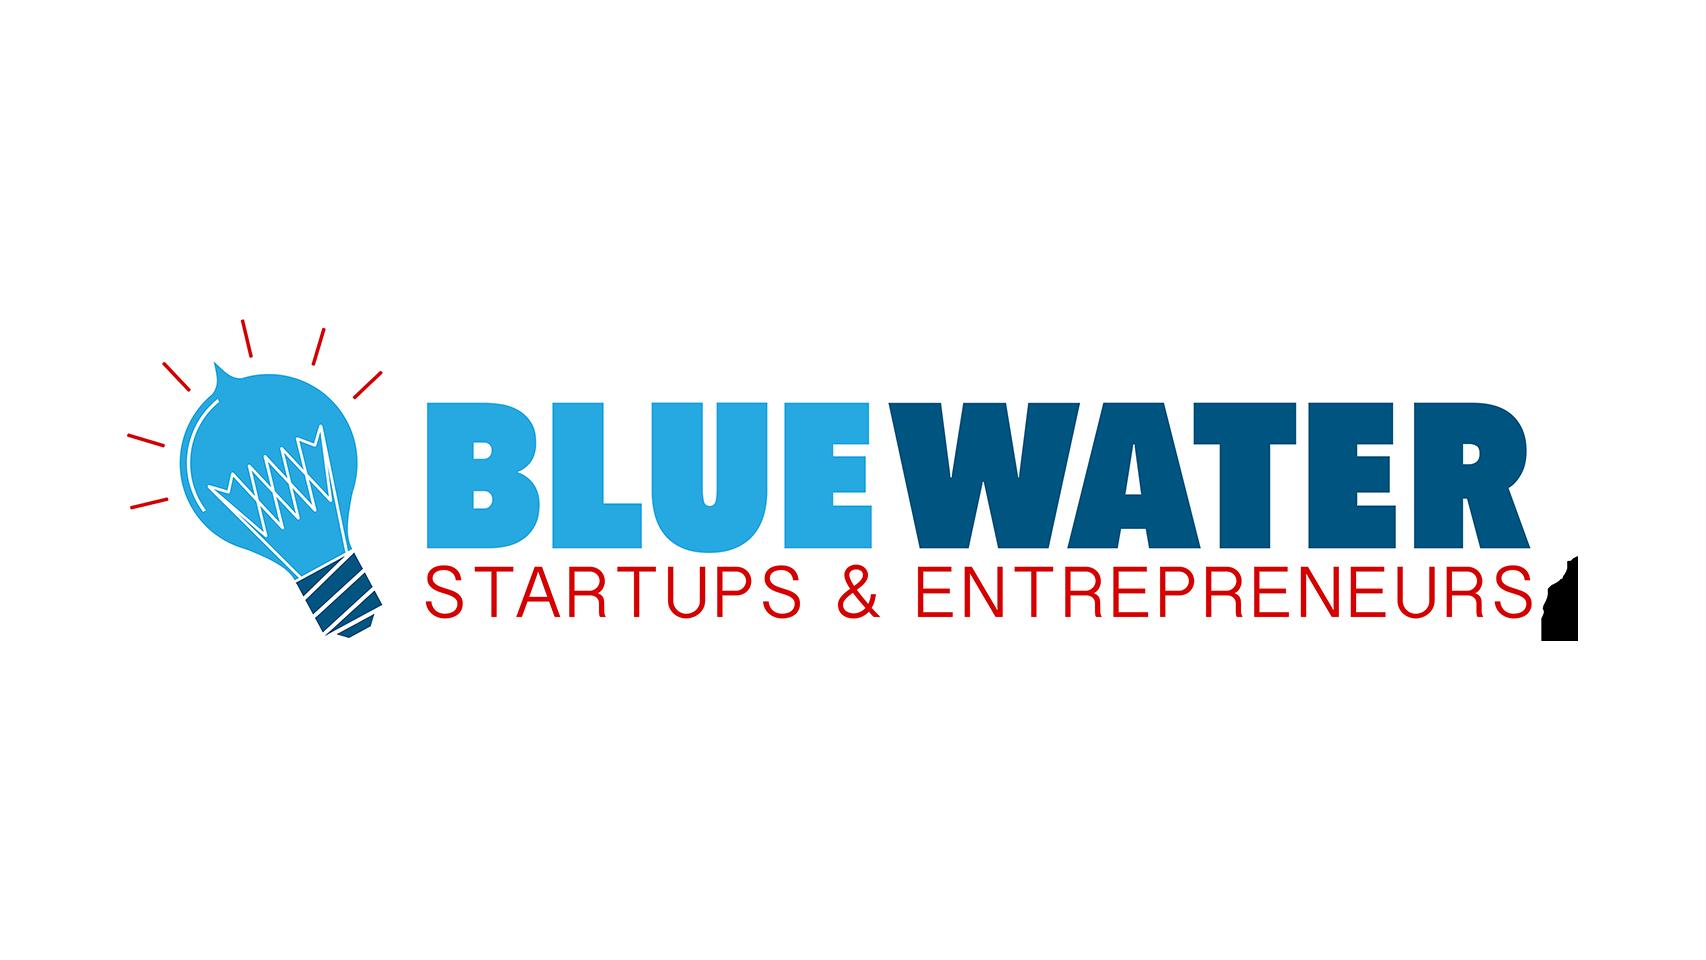 Blue-Water-Startups-and-Entrepreneurs-Logo